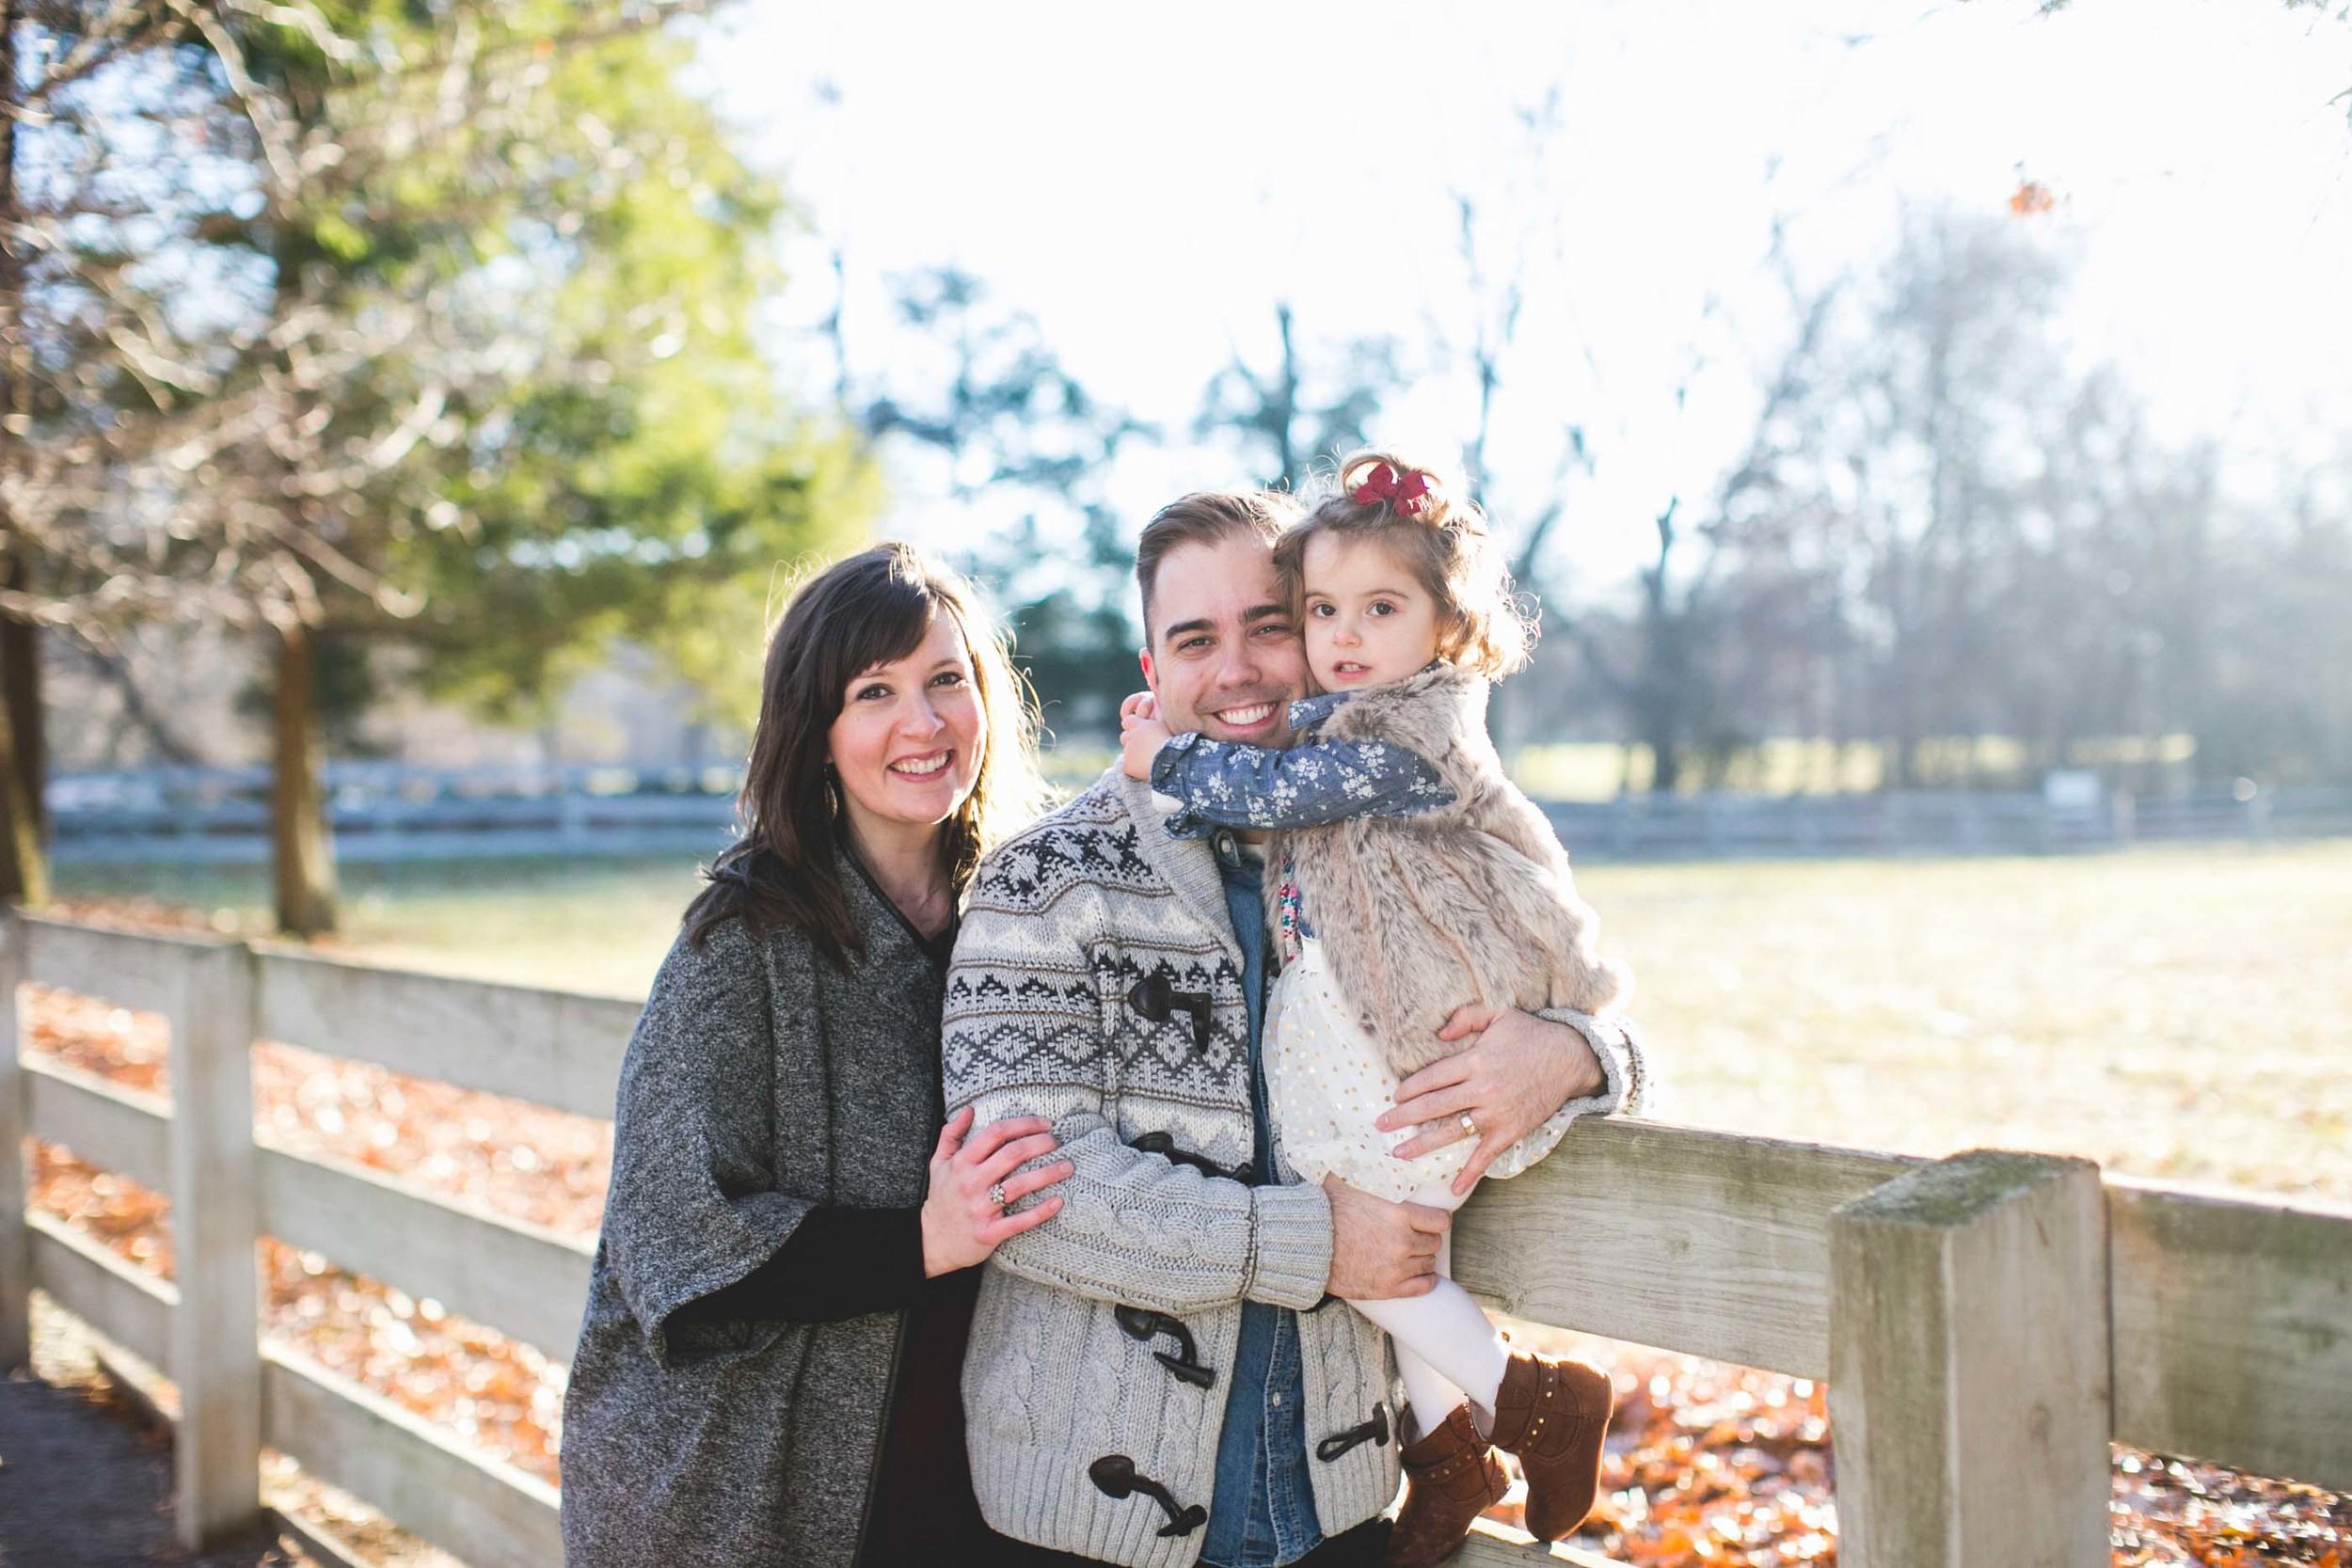 Family-Photographer-Beverly-MA-3-5.jpg